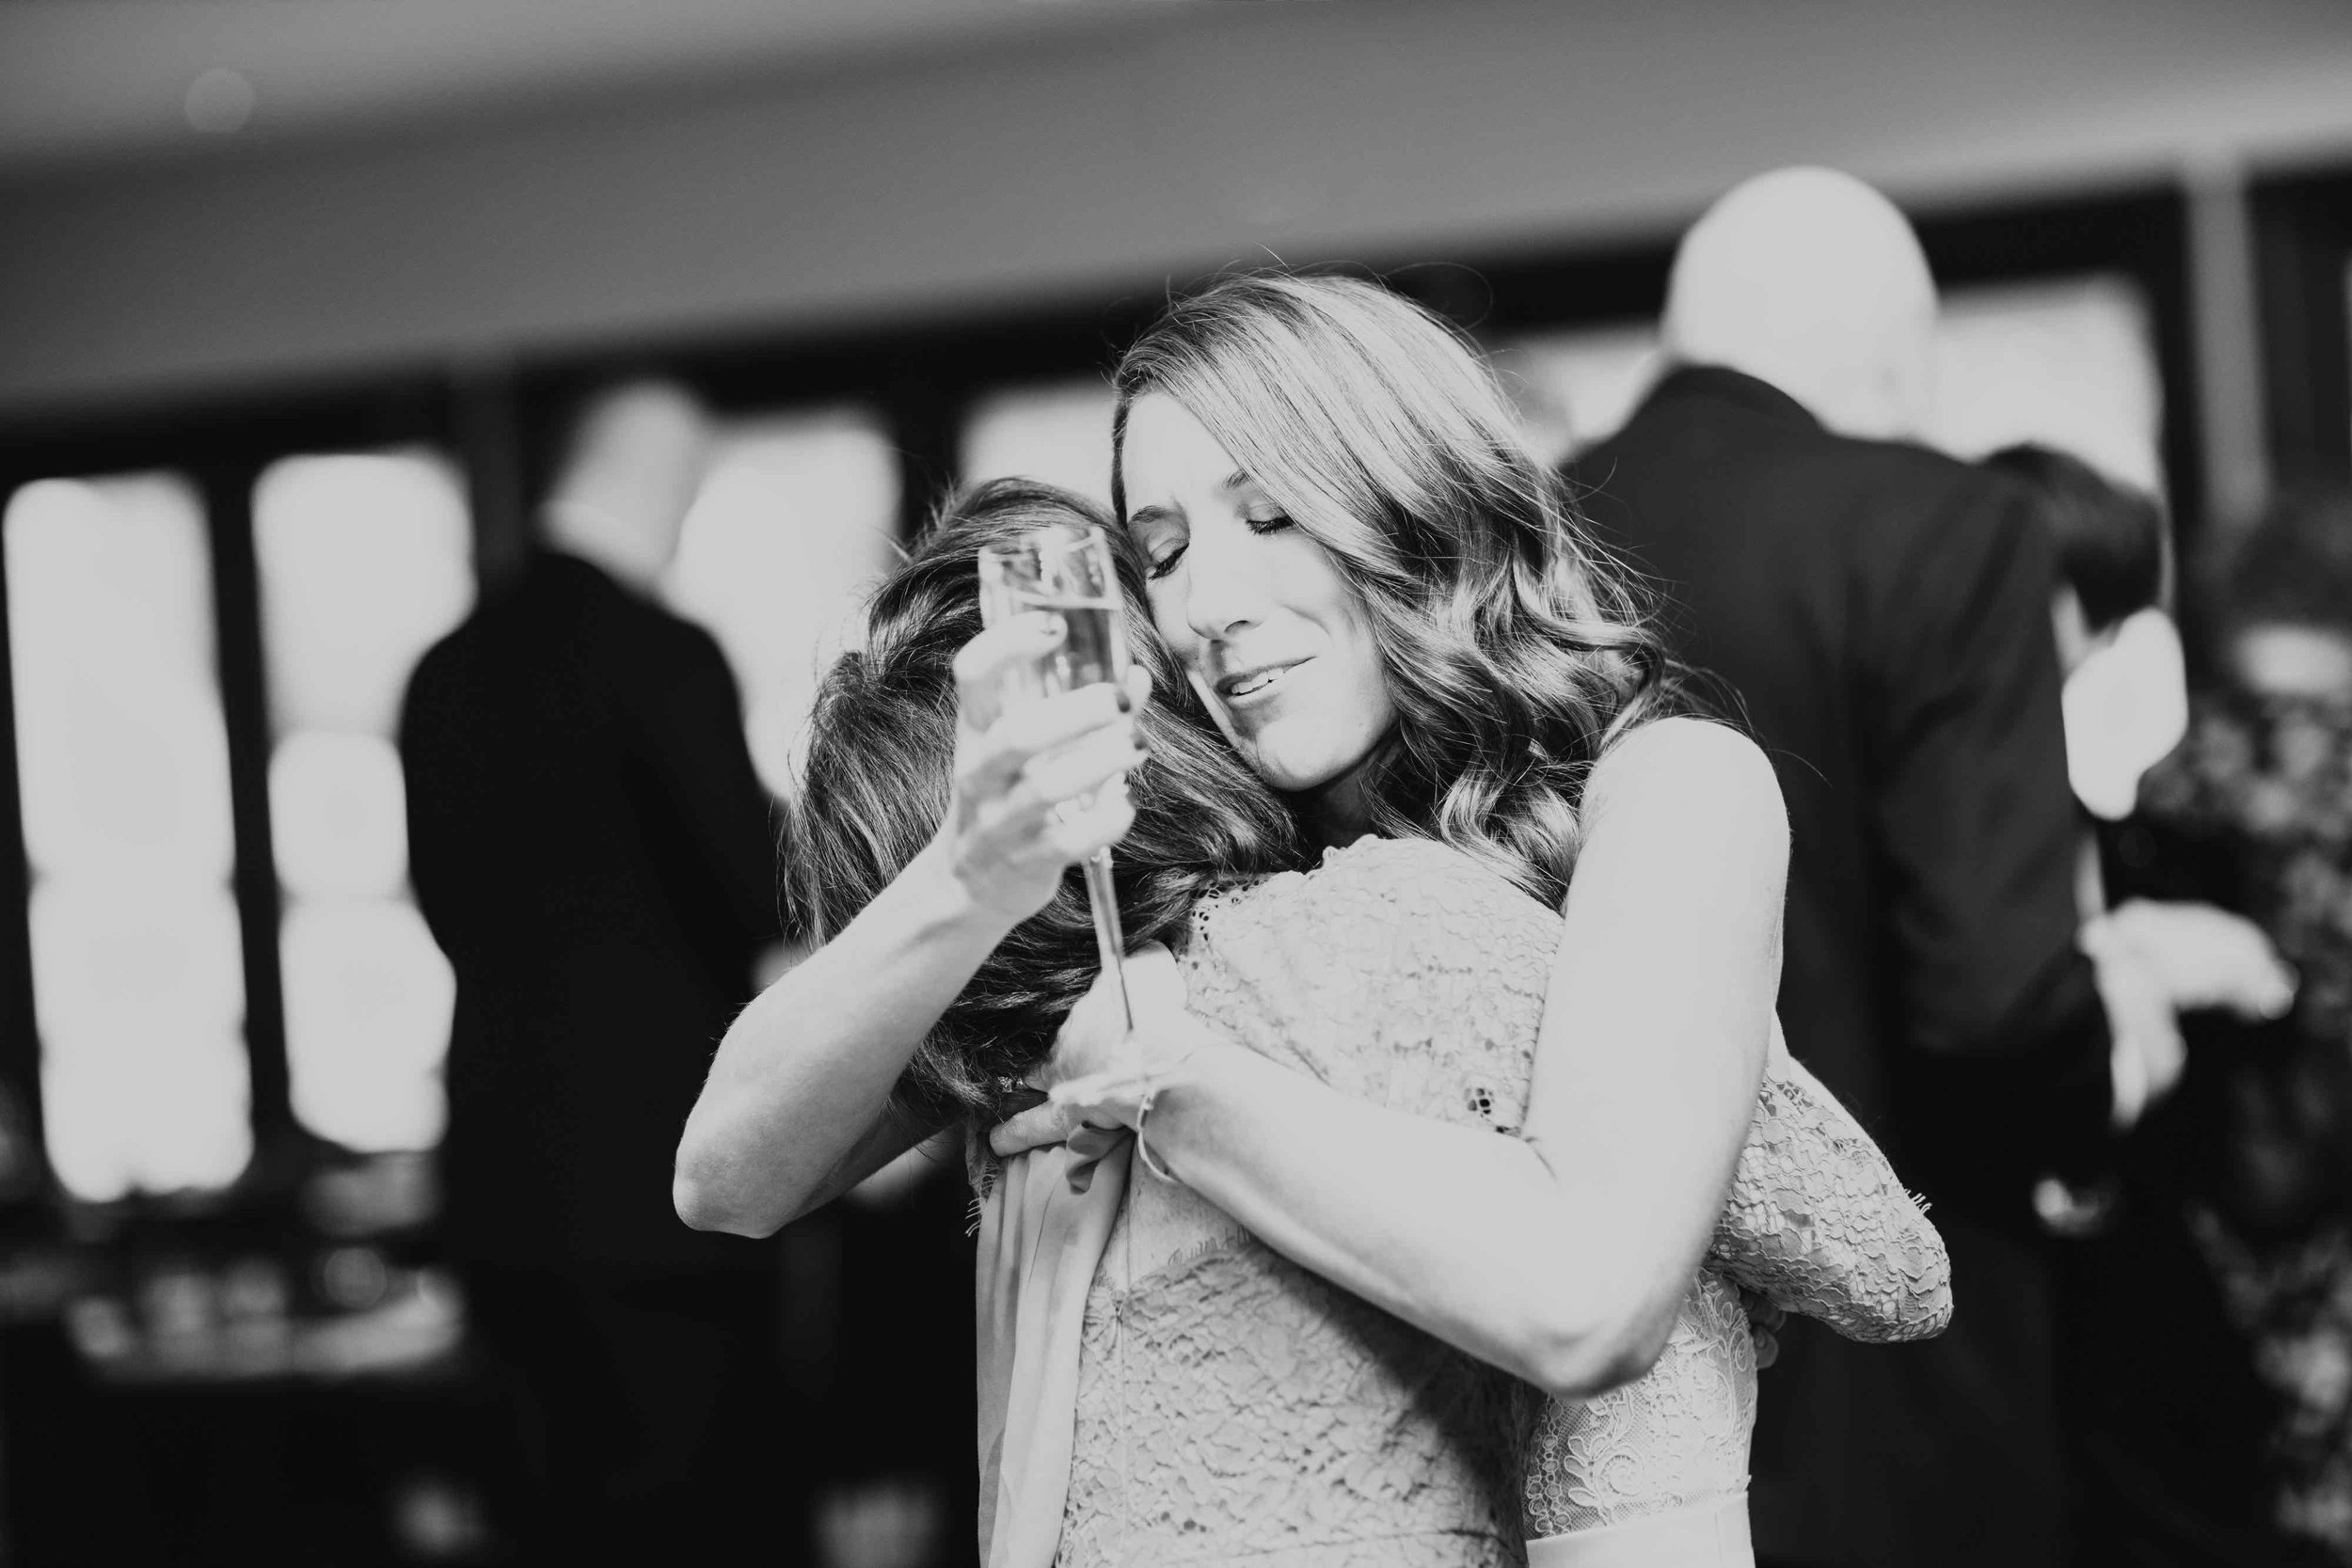 Kisa Conrad Favorites-0050-colorado-wedding-photographer-denver-springs-vailhotel-glenwood-springs-colorado-wedding-photographer.jpeg